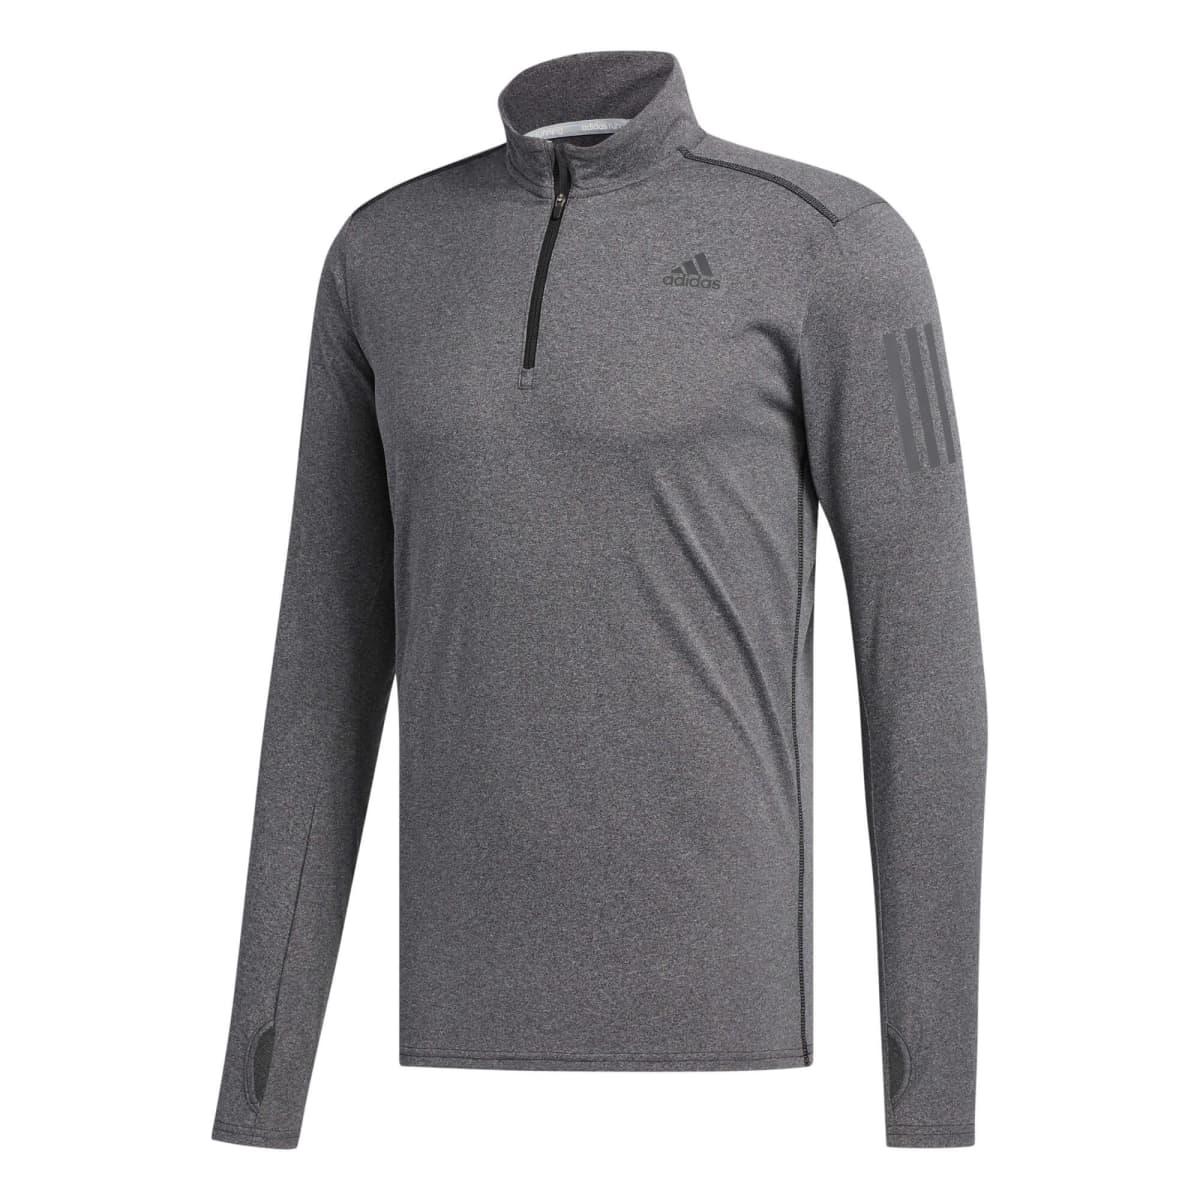 Adidas Men s Response 1 2 Zip Long Sleeve Top 9904ad4b61